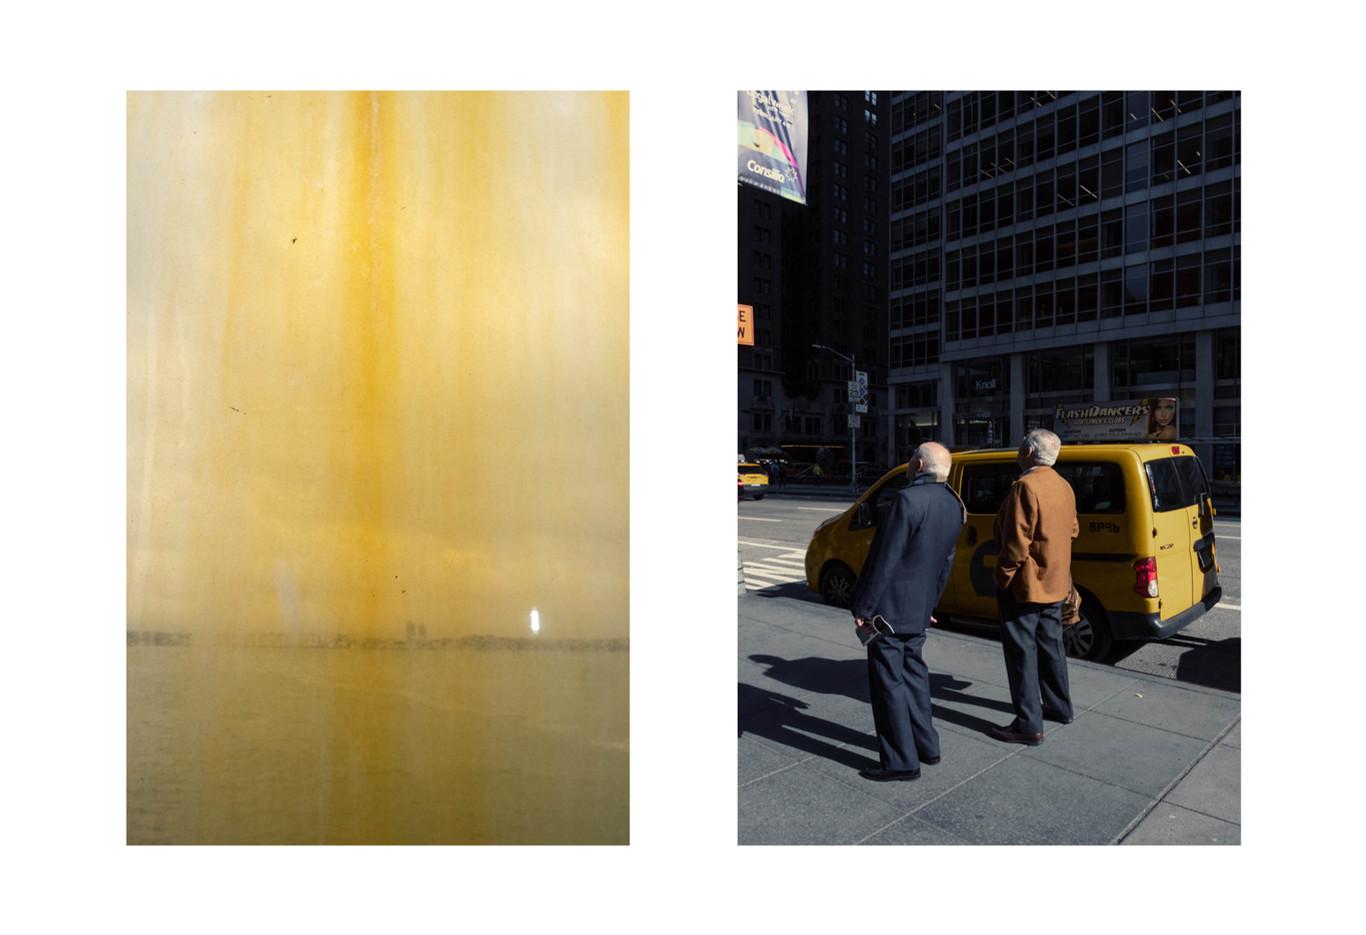 New York City, 2019